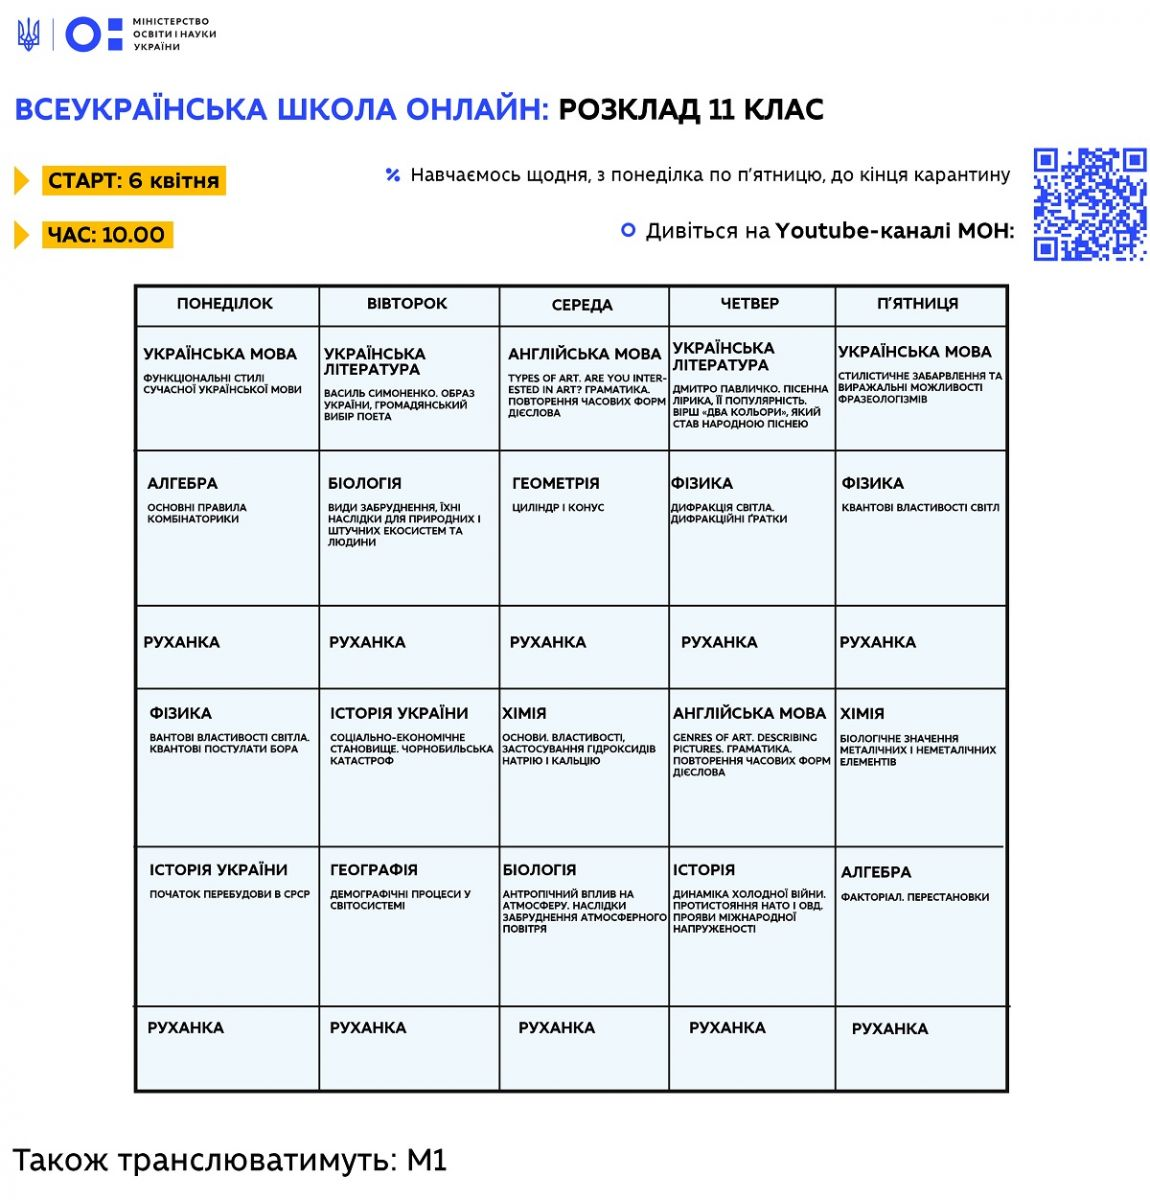 "Расписание уроков онлайн 11 класс: ""Всеукраинская школа онлайн"" / Фото: МОН"